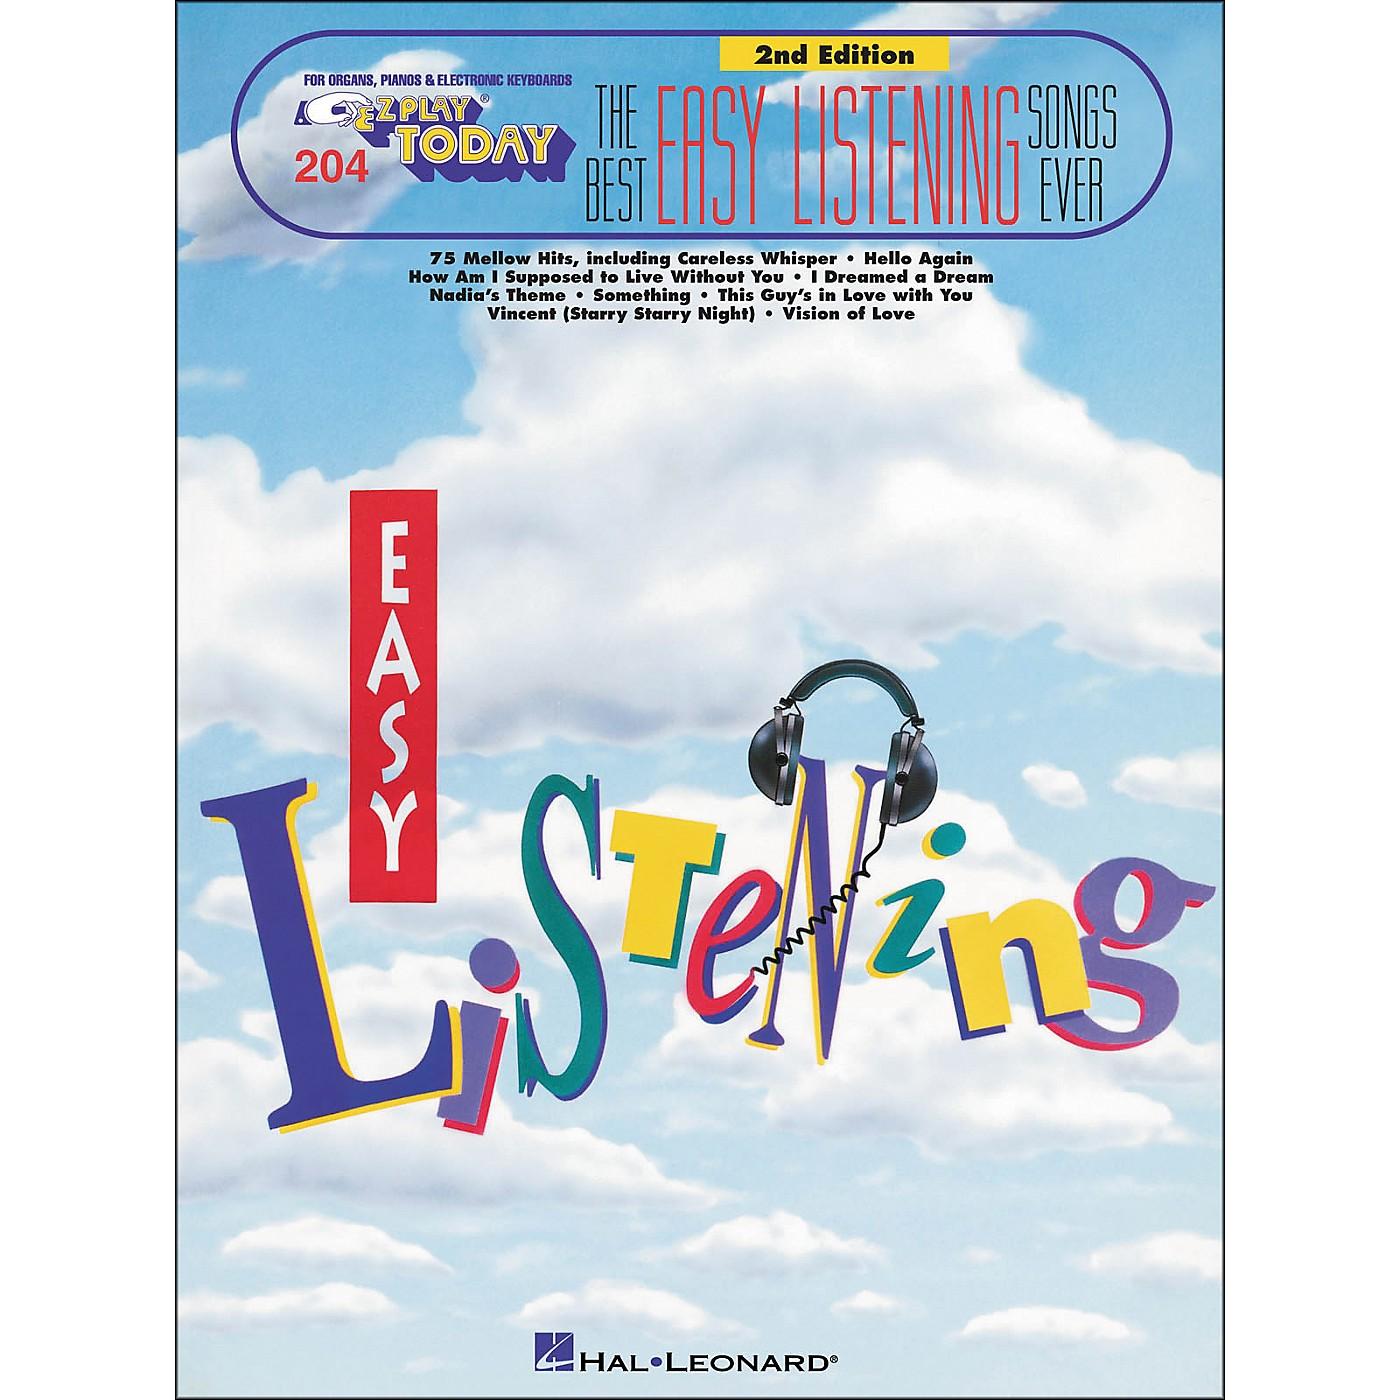 Hal Leonard Best Easy Listening Ever 2nd Edition E-Z Play 204 thumbnail